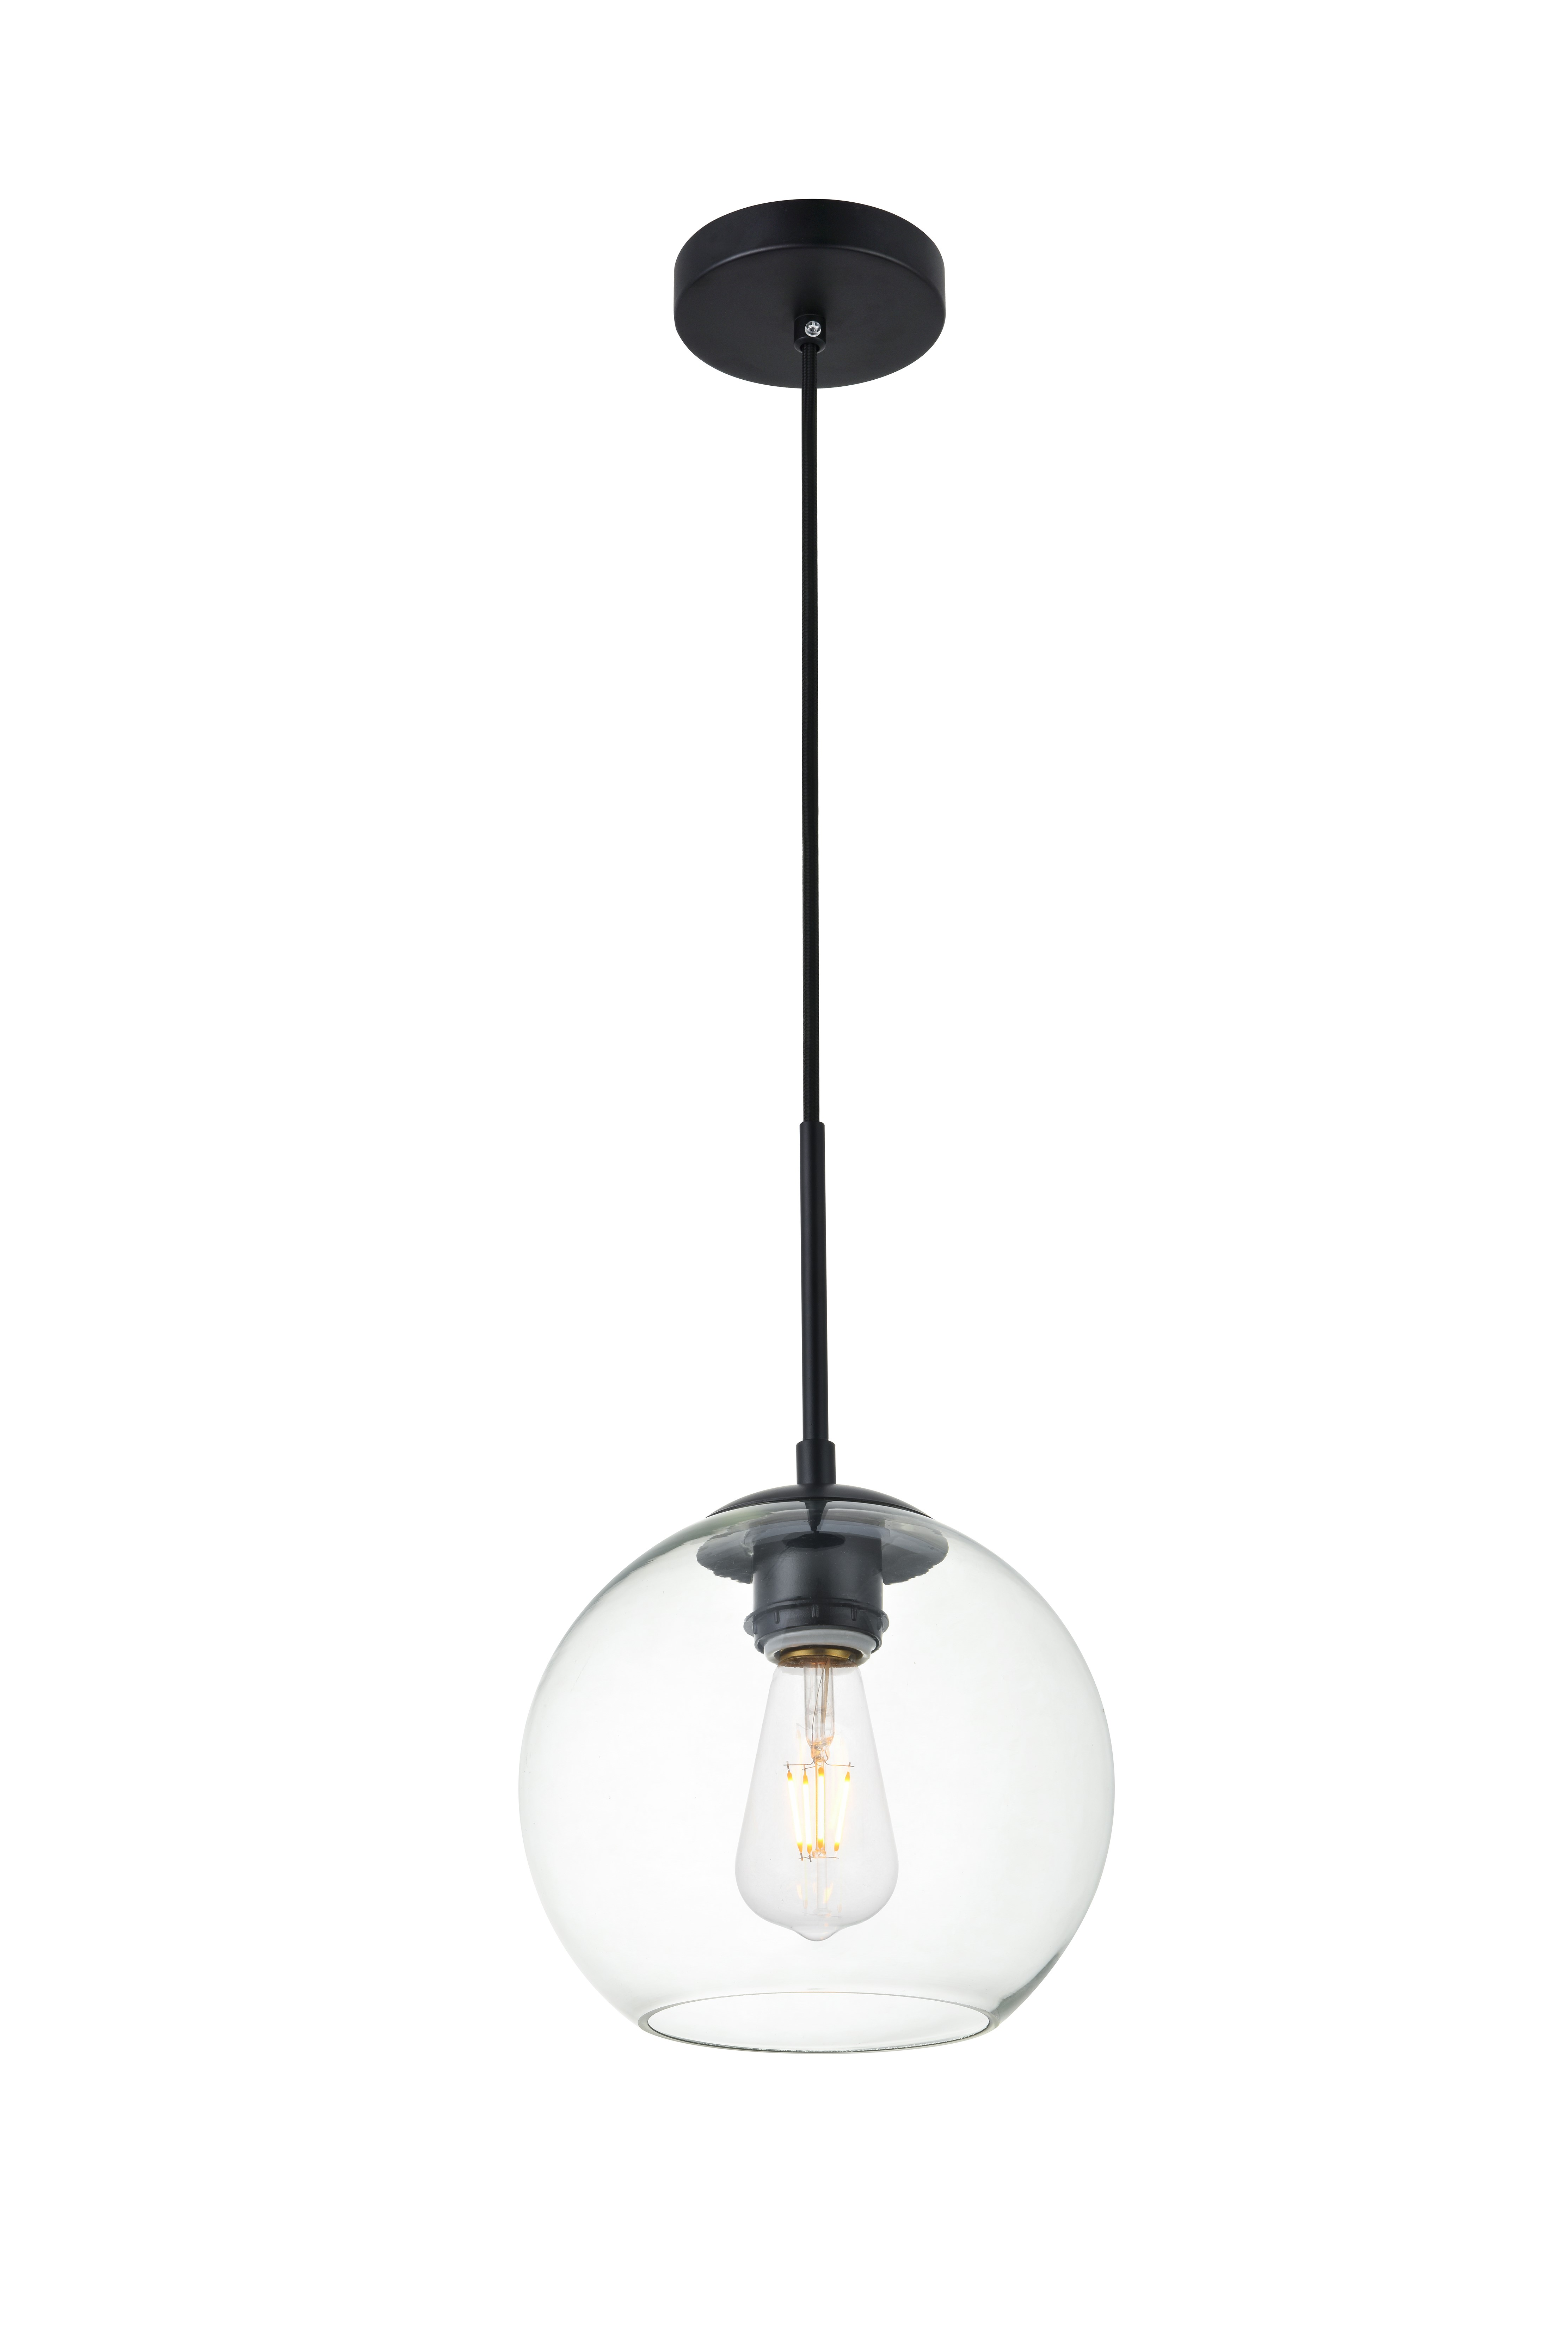 Living district ld2206bk baxter 1 light pendant ceiling light with clear glass black